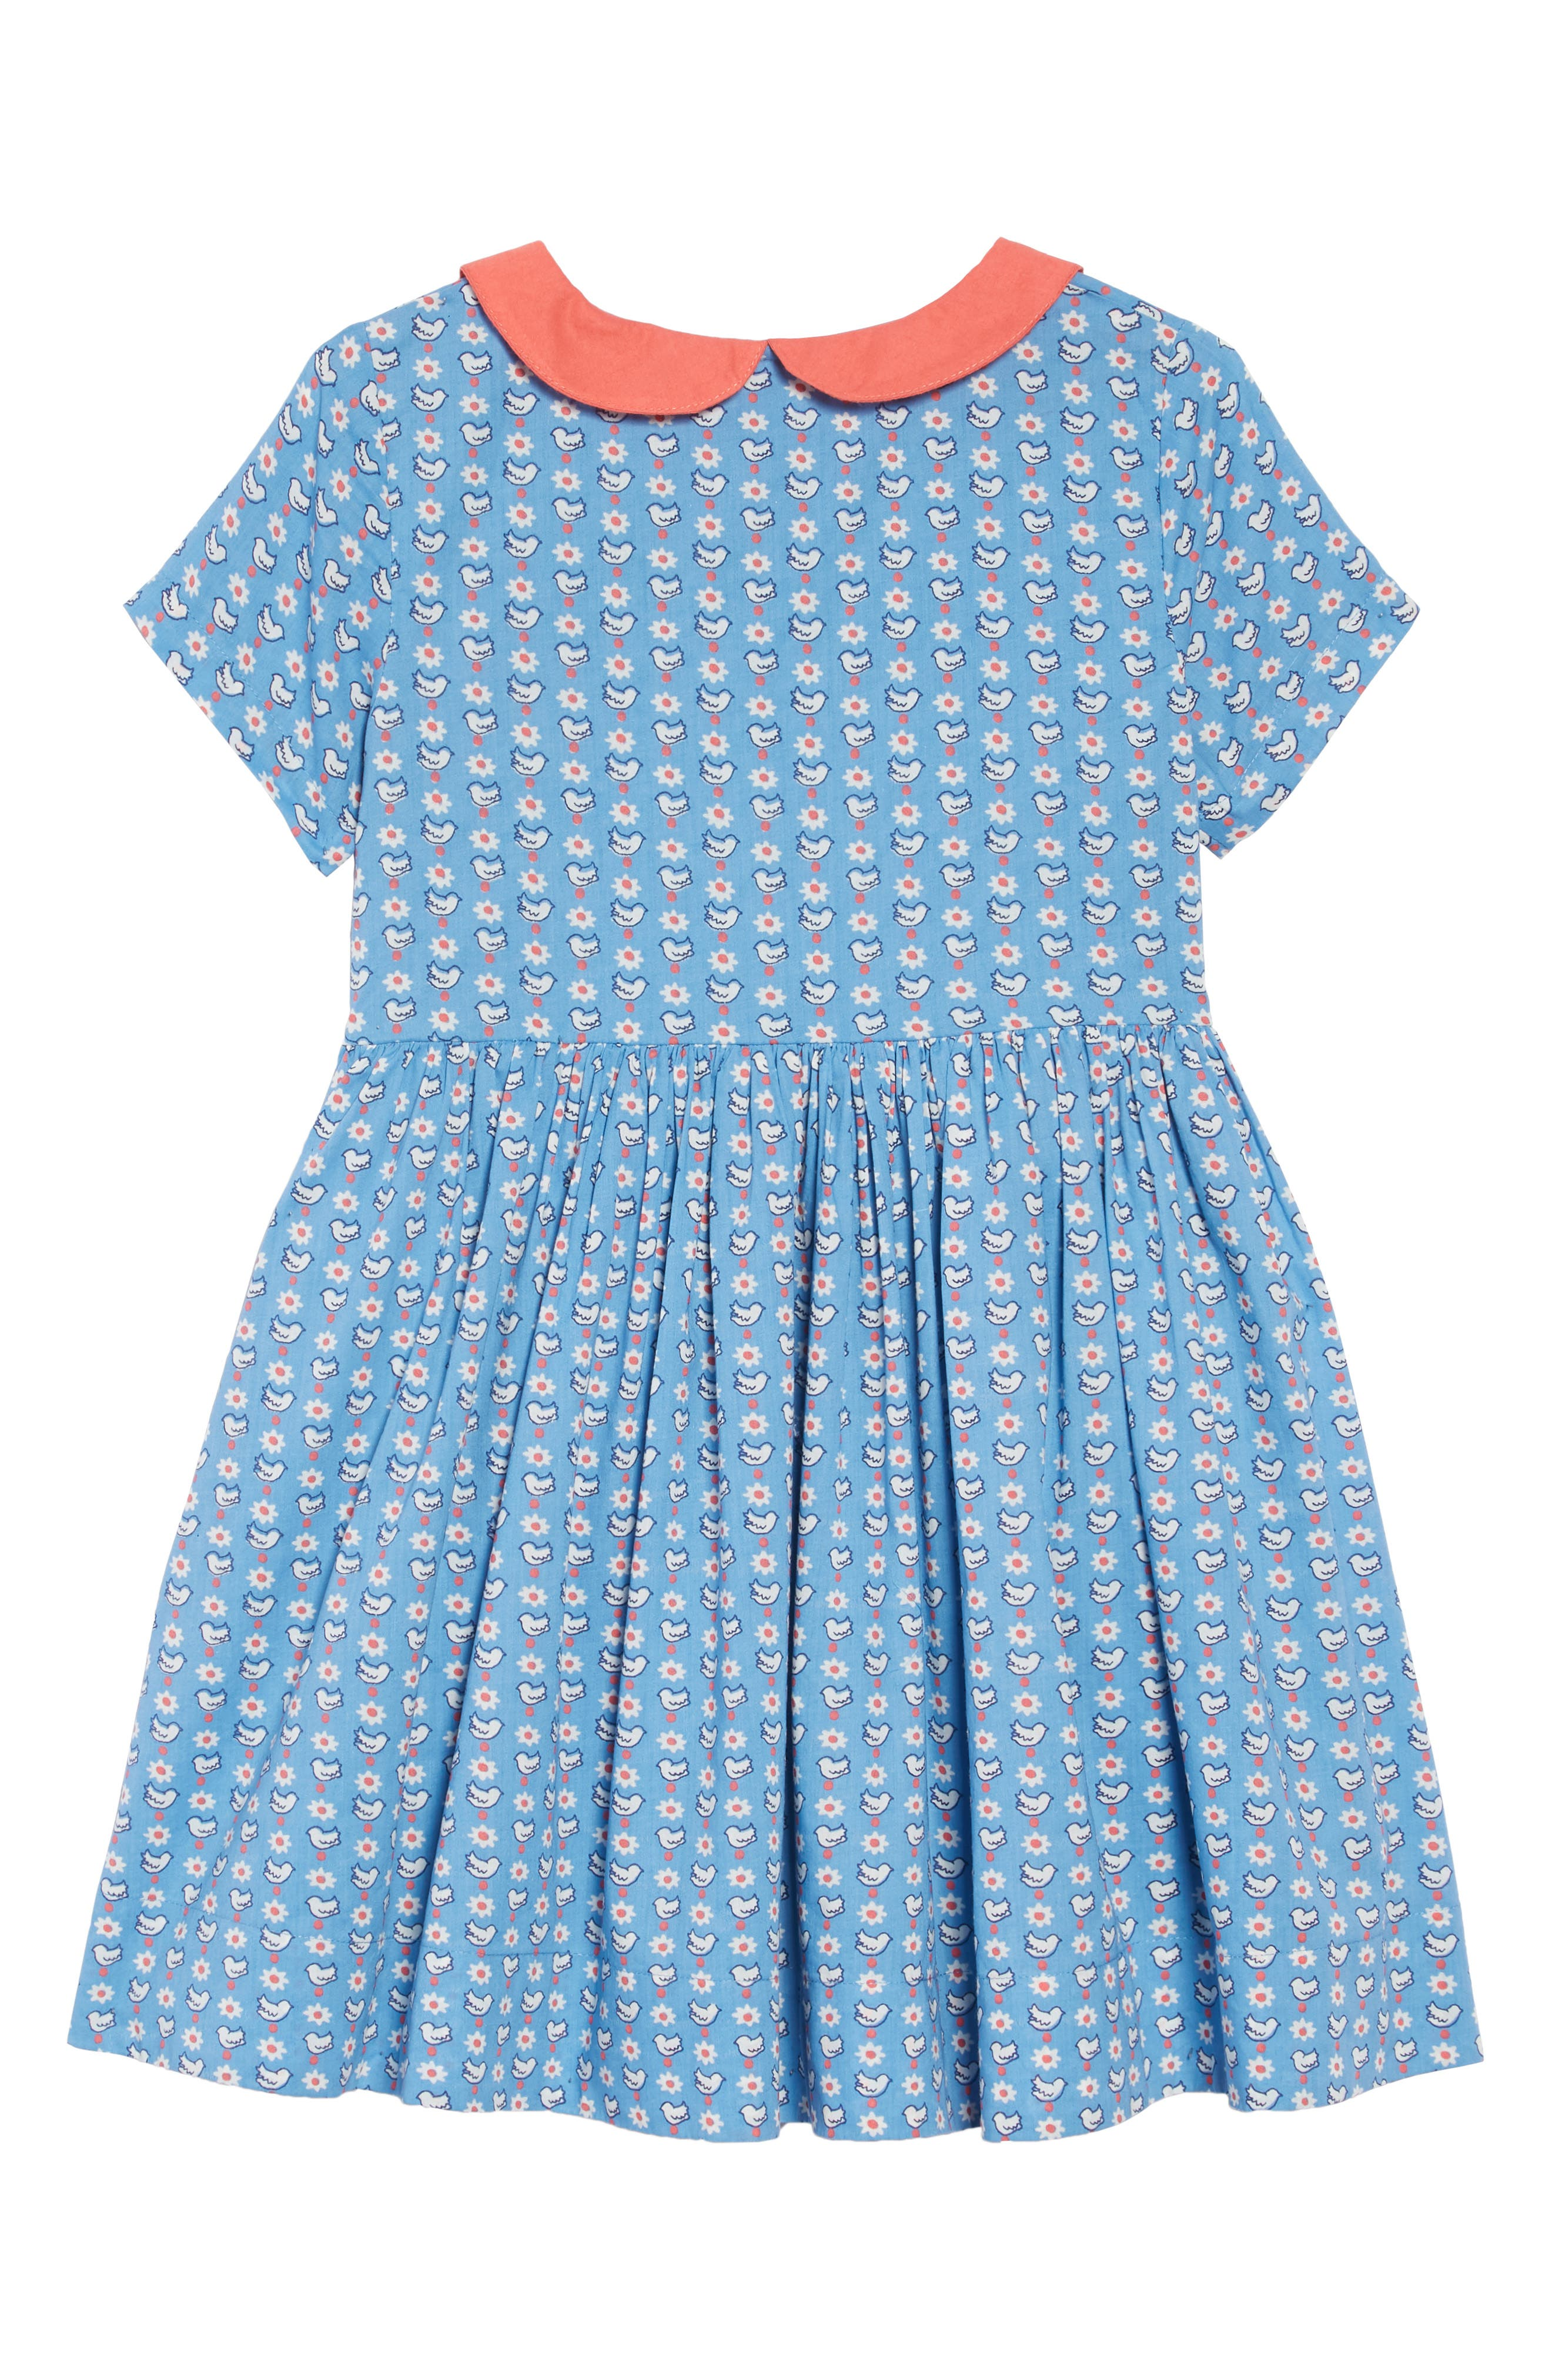 Nostalgic Collared Dress,                             Alternate thumbnail 2, color,                             BLUE GEO BIRDS